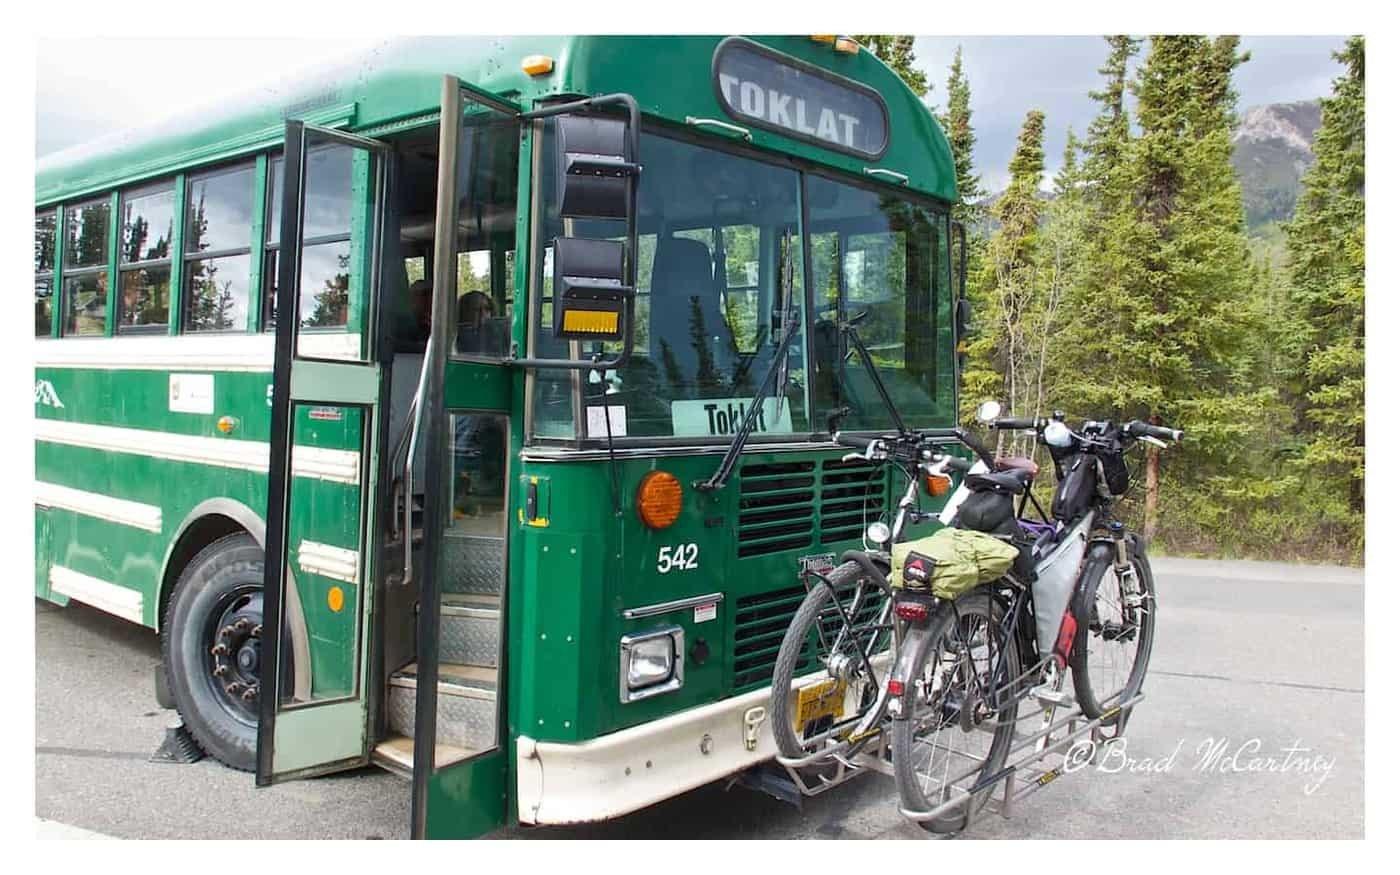 Bus transporting bicycles in Denali National Park